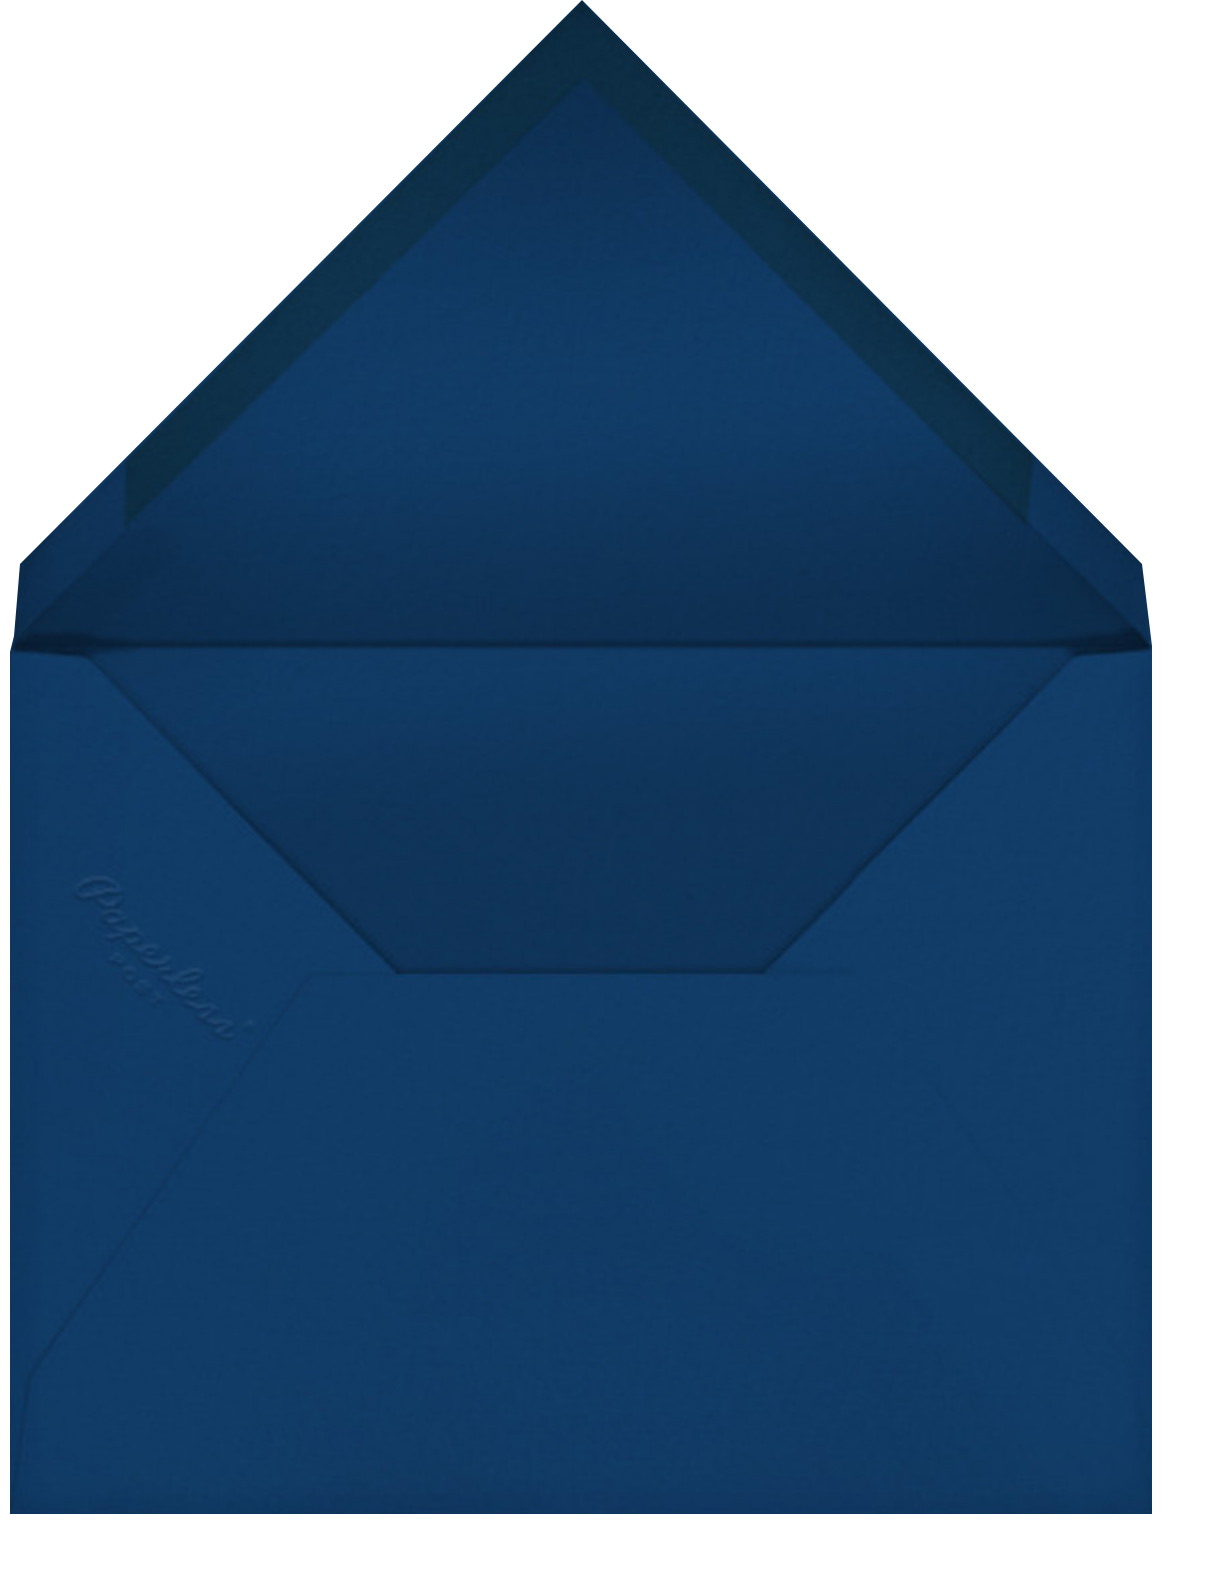 Cupcake Foils - Paperless Post - Envelope